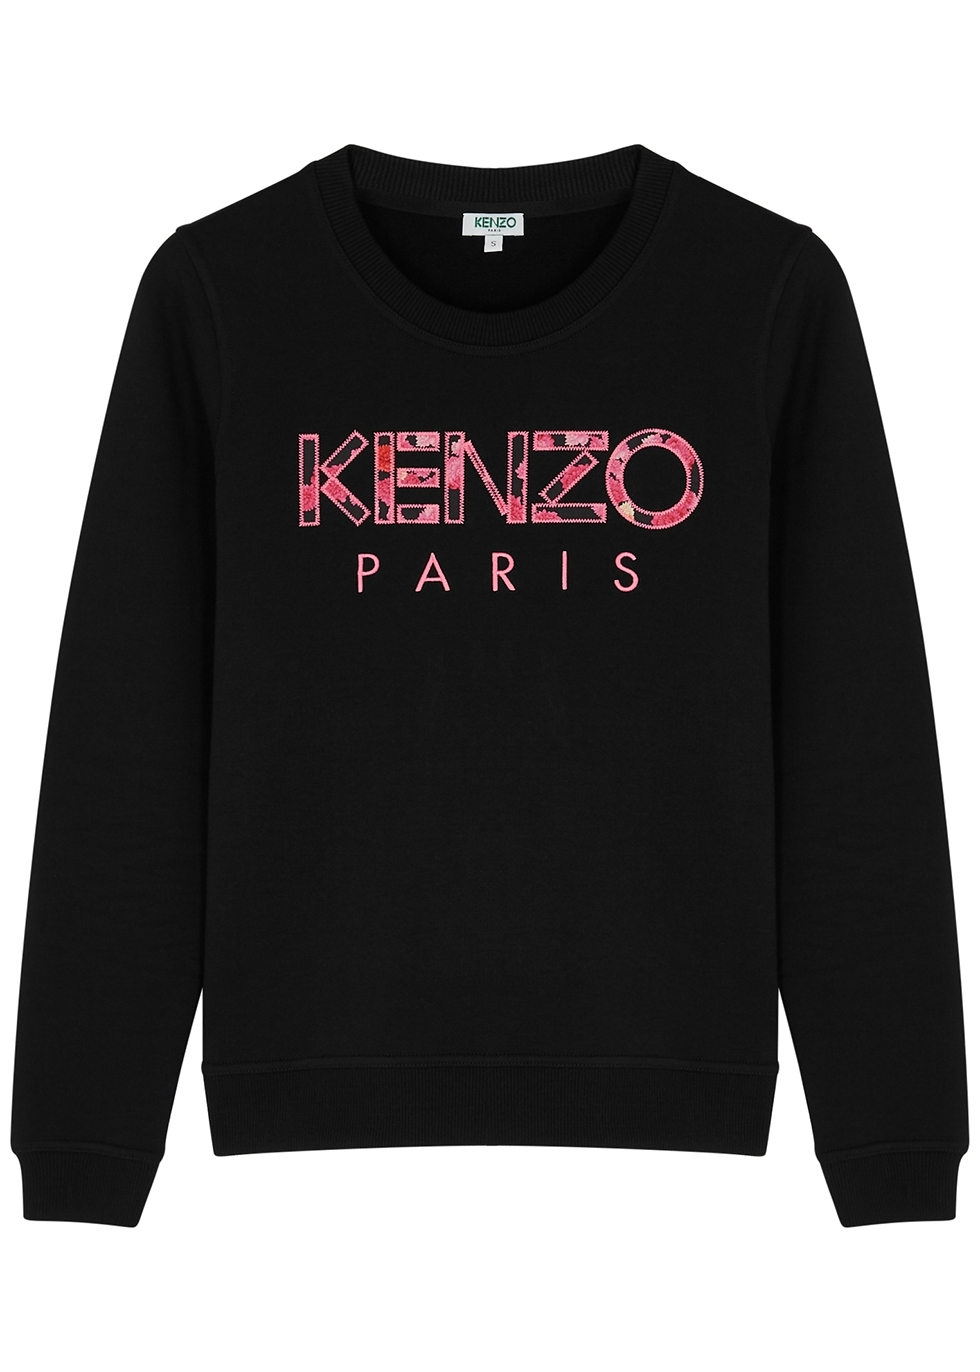 259e59d1659c Kenzo - Designer Sweatshirts, T-Shirts, Bags - Harvey Nichols